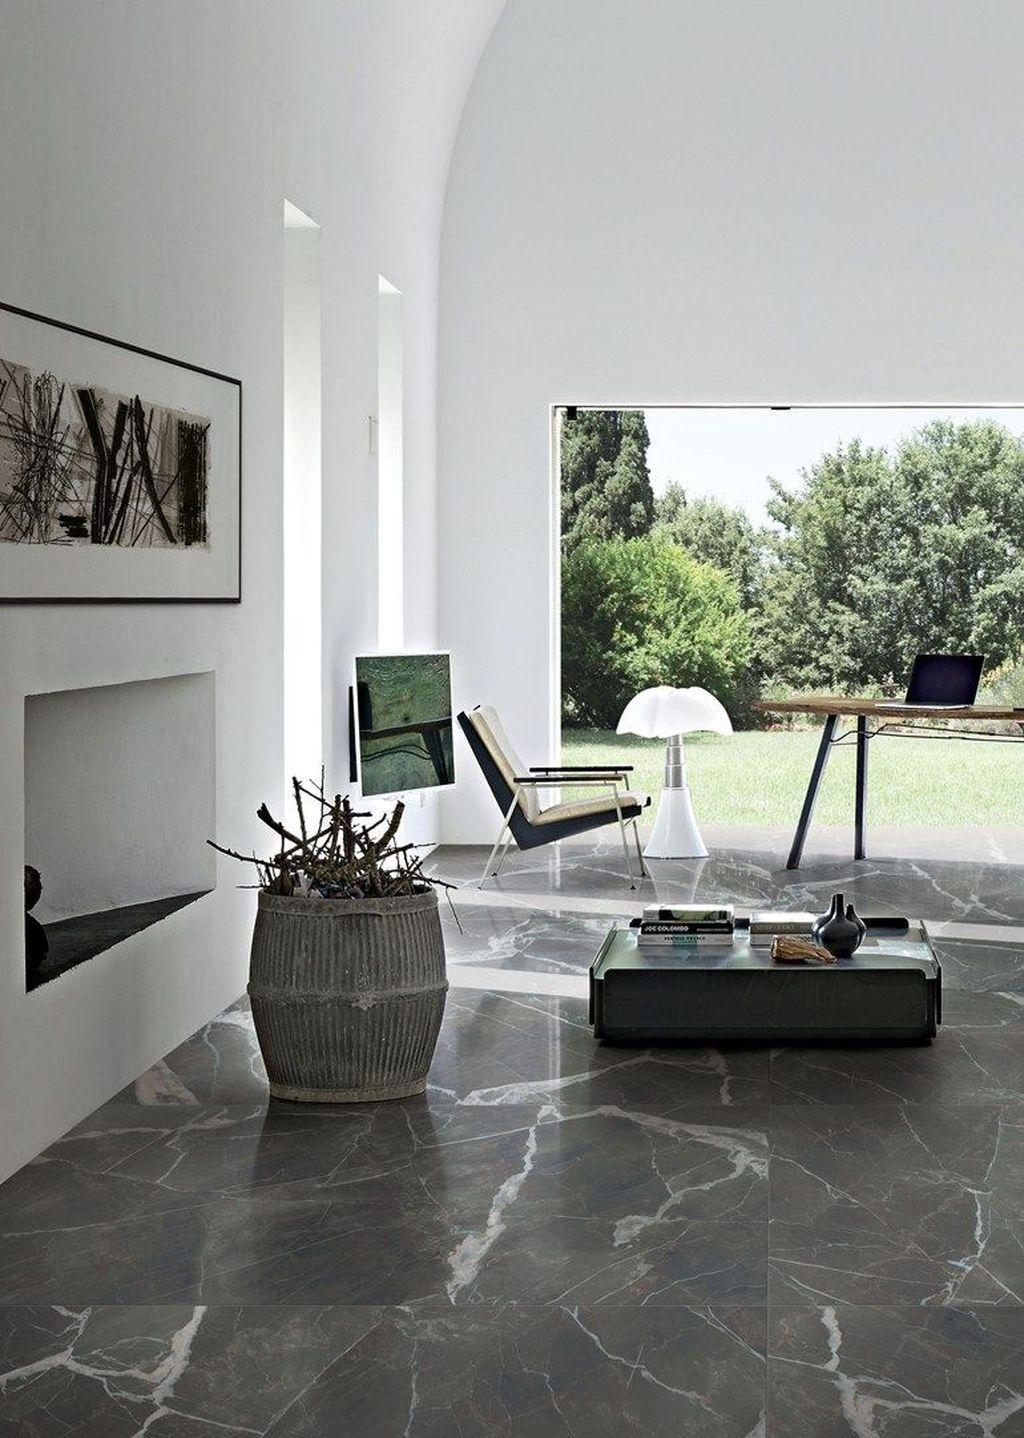 30 Luxurious Living Room Design Ideas With Floor Granite Tile | Marble  living room floor, Living room tiles, Tile floor living room